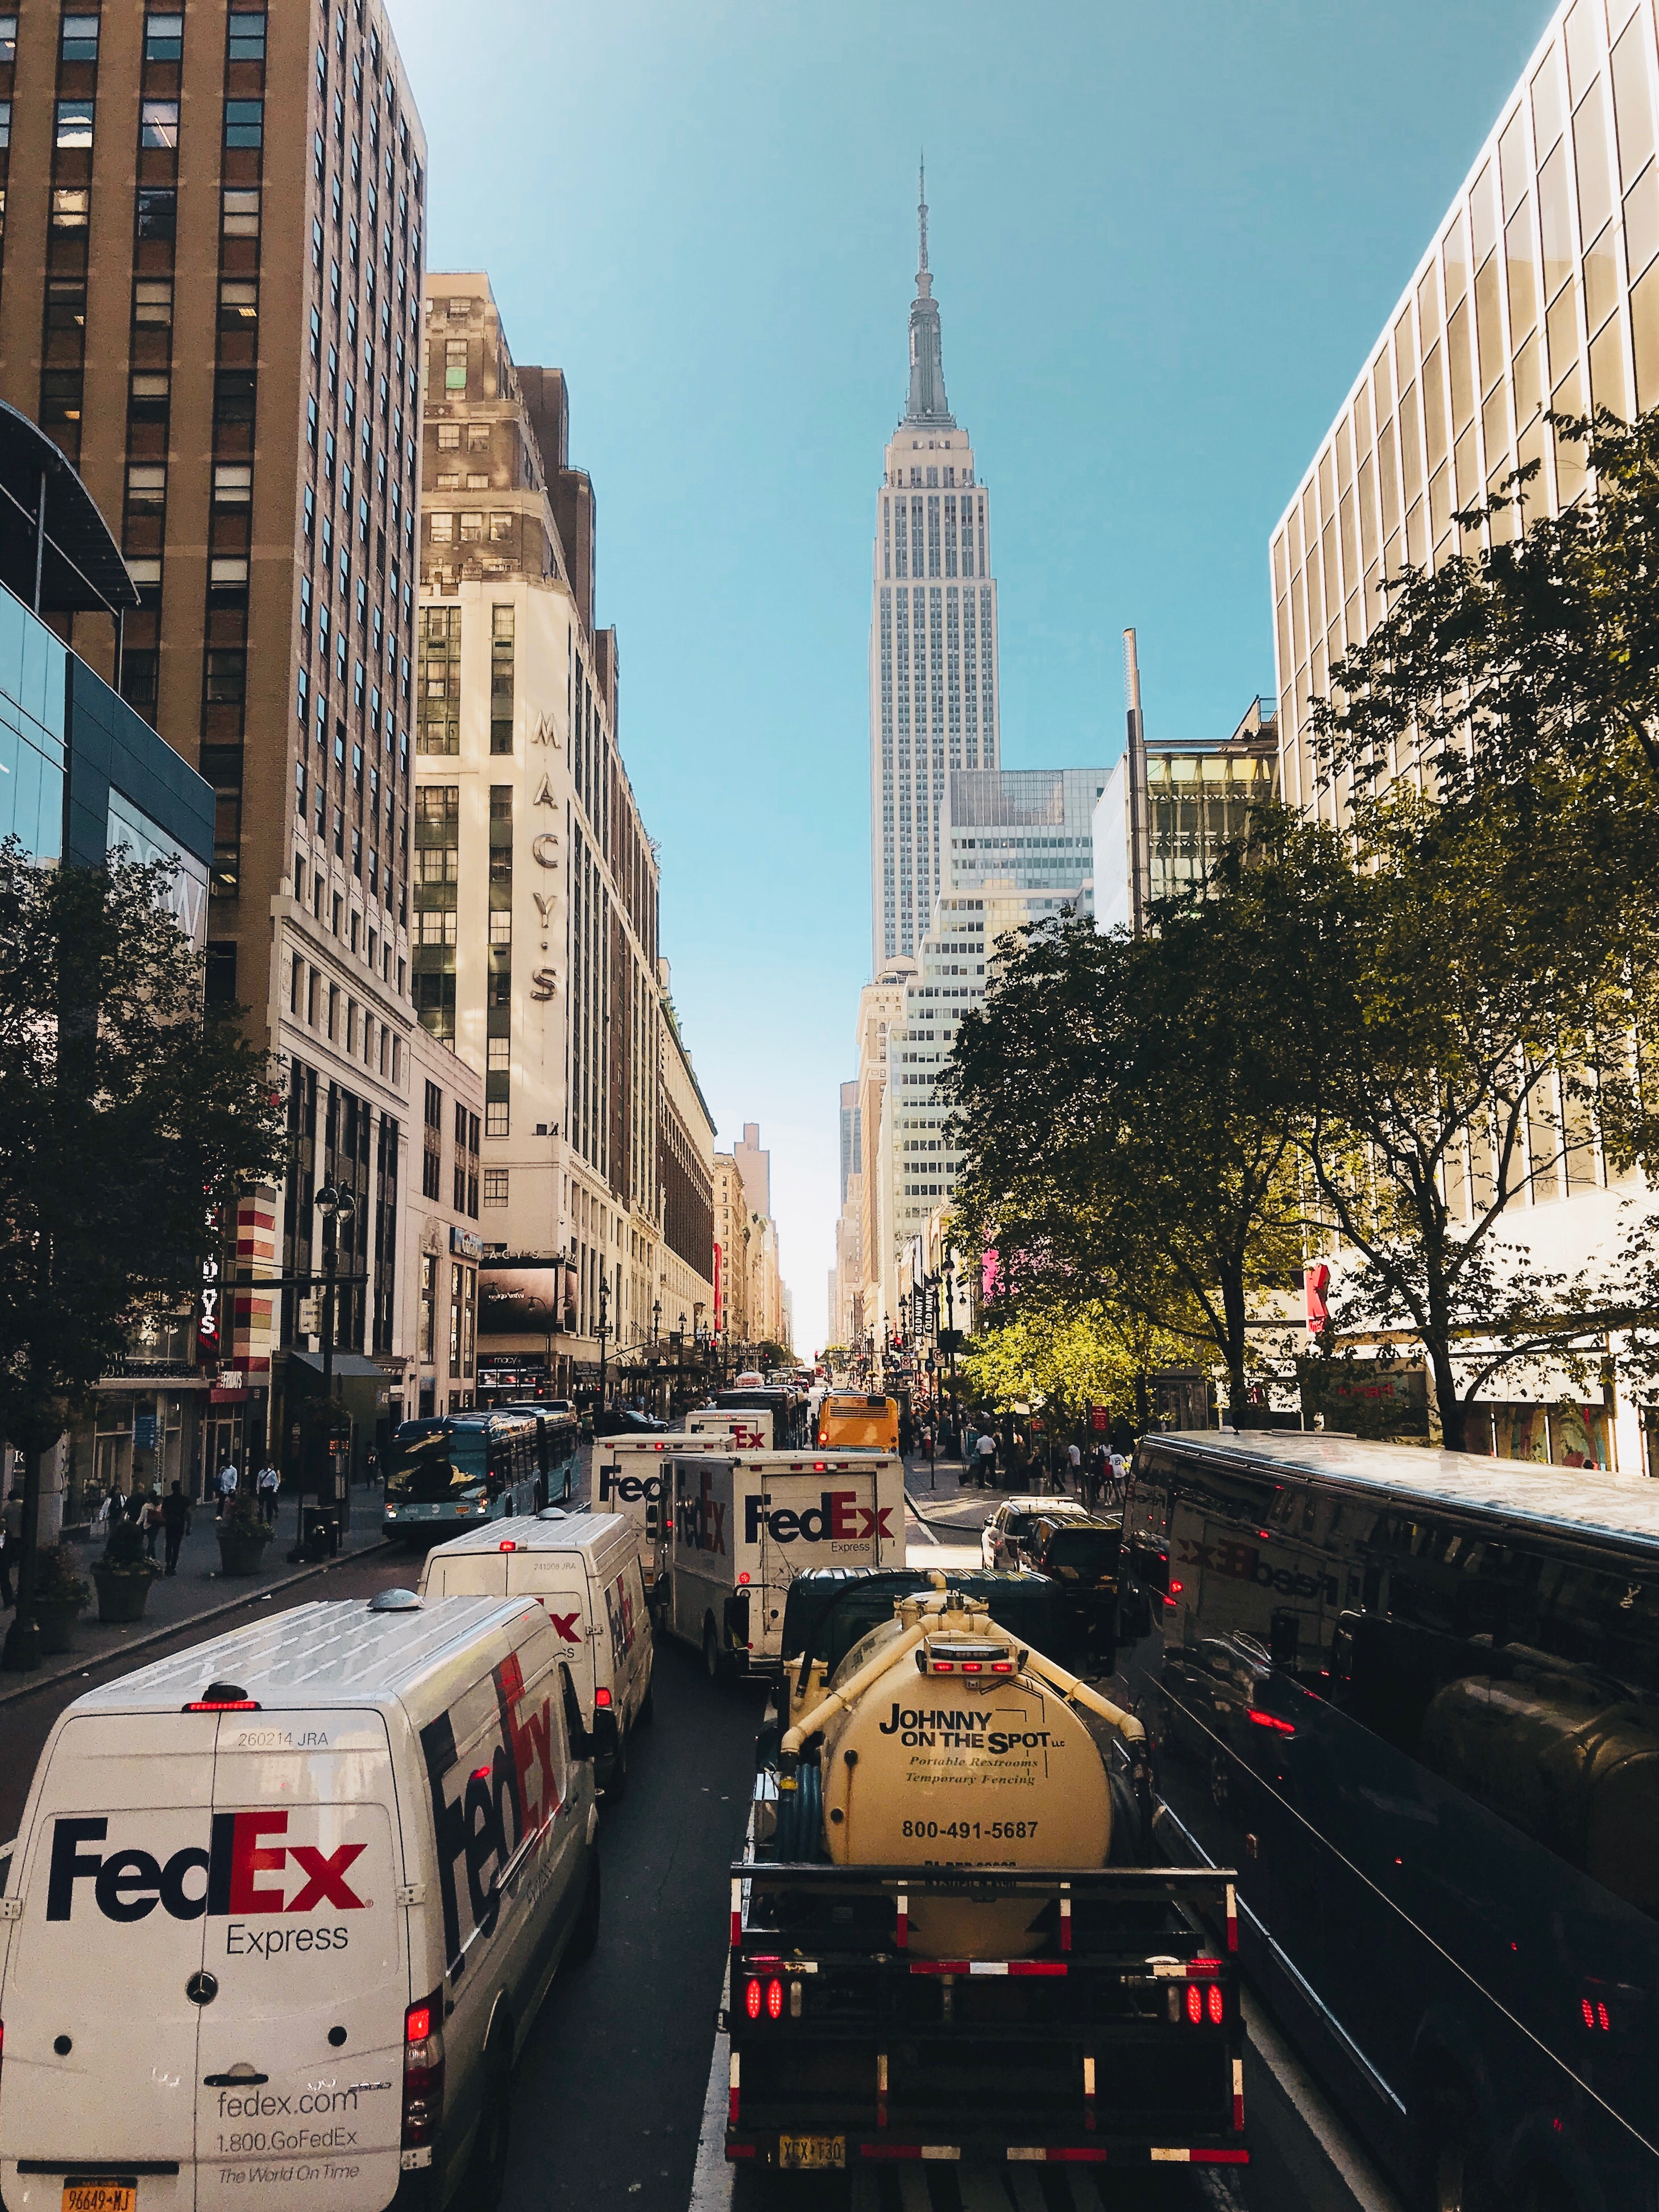 viaggio-a-new-york-manhattan-empire-state-building